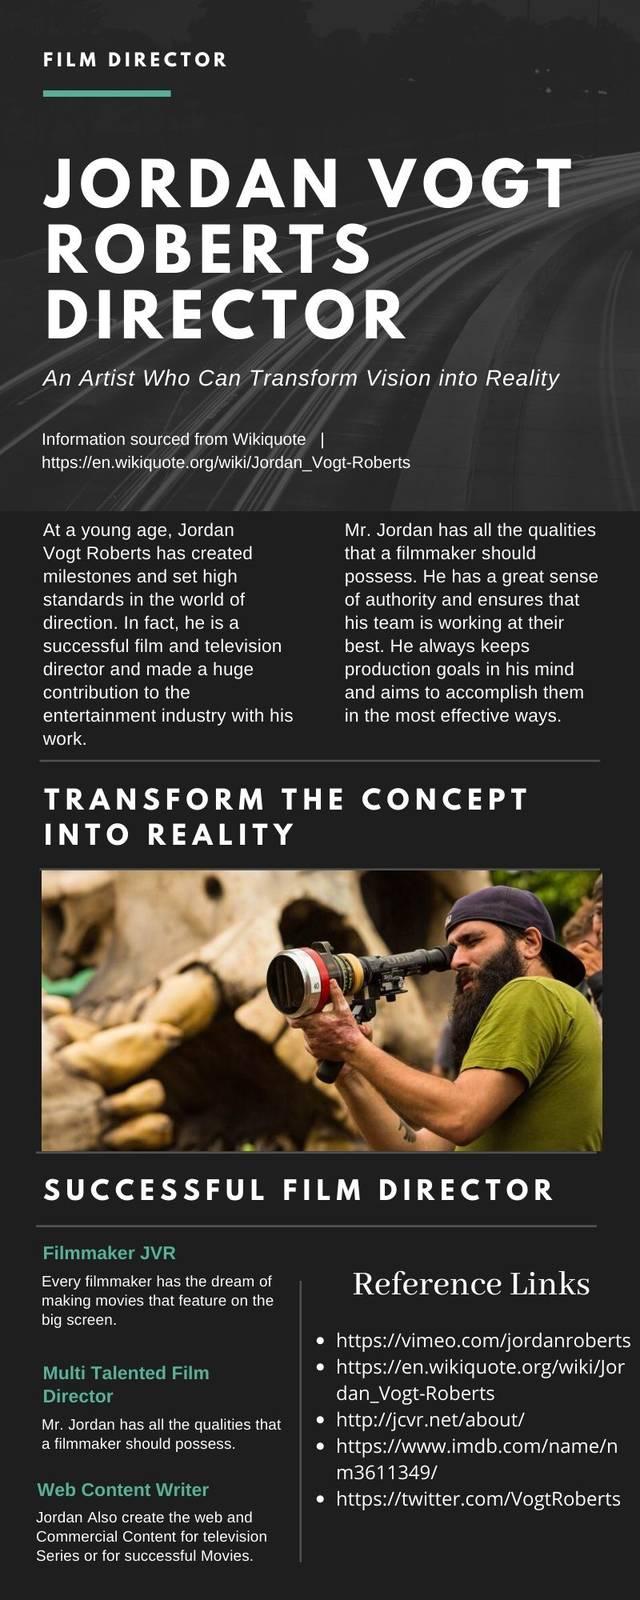 Jordan vogt roberts film director transform vision into reality